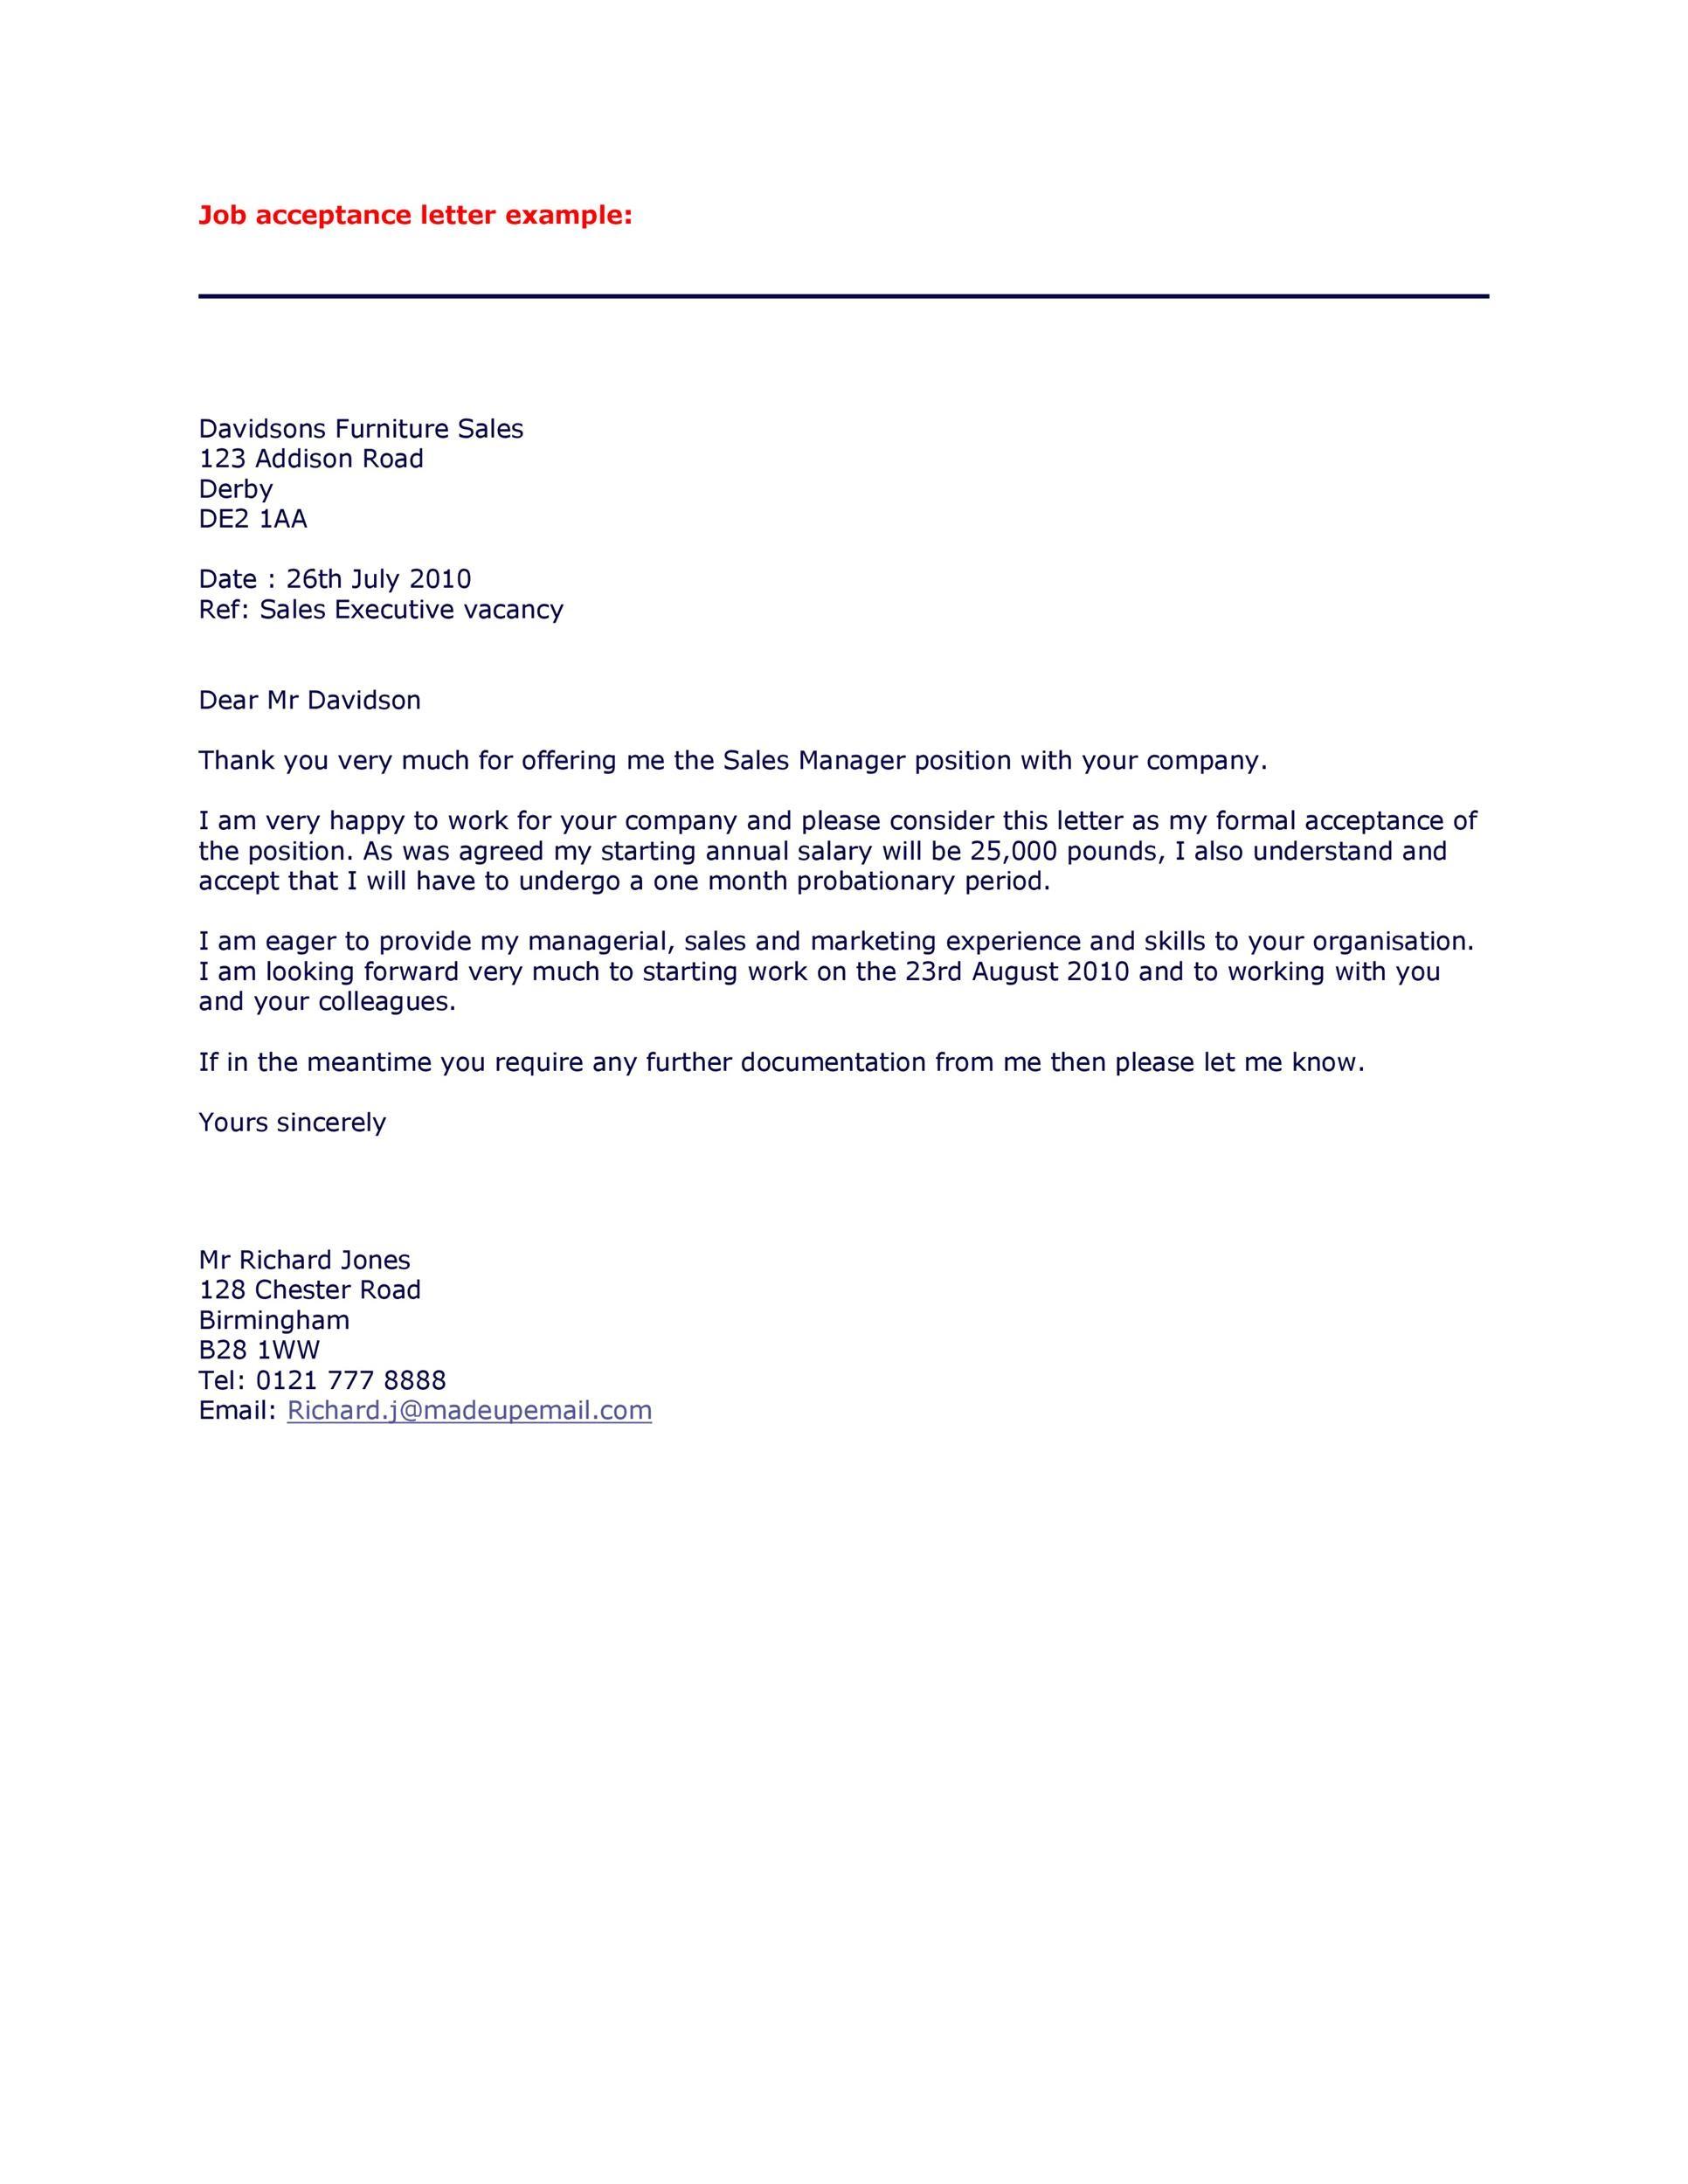 Free job acceptance letter 04